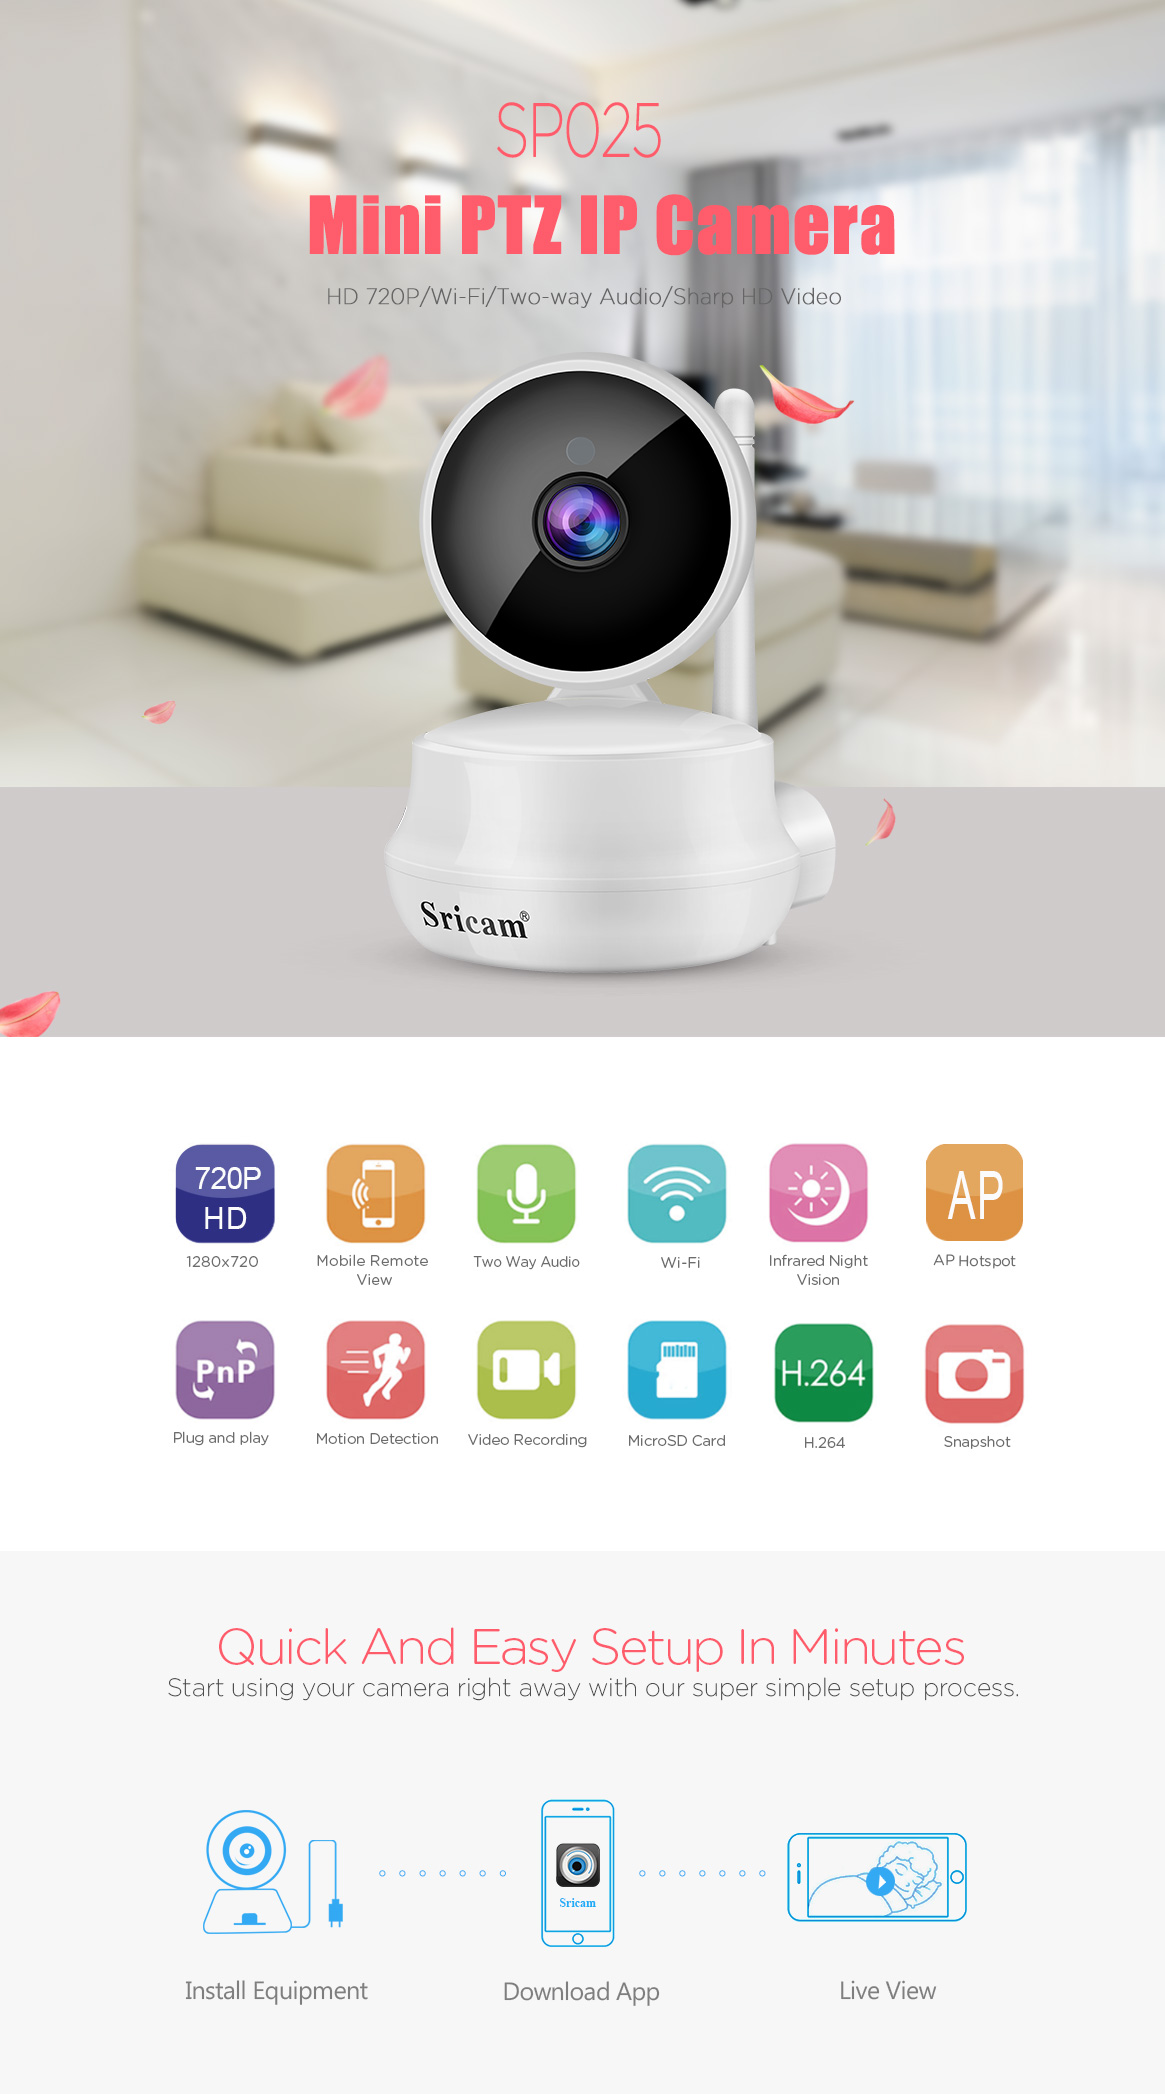 Sricam New wireless megapixel Security Camera System Wireless IP Camera NVR wifi cctv camera  with Night Vision.jpg